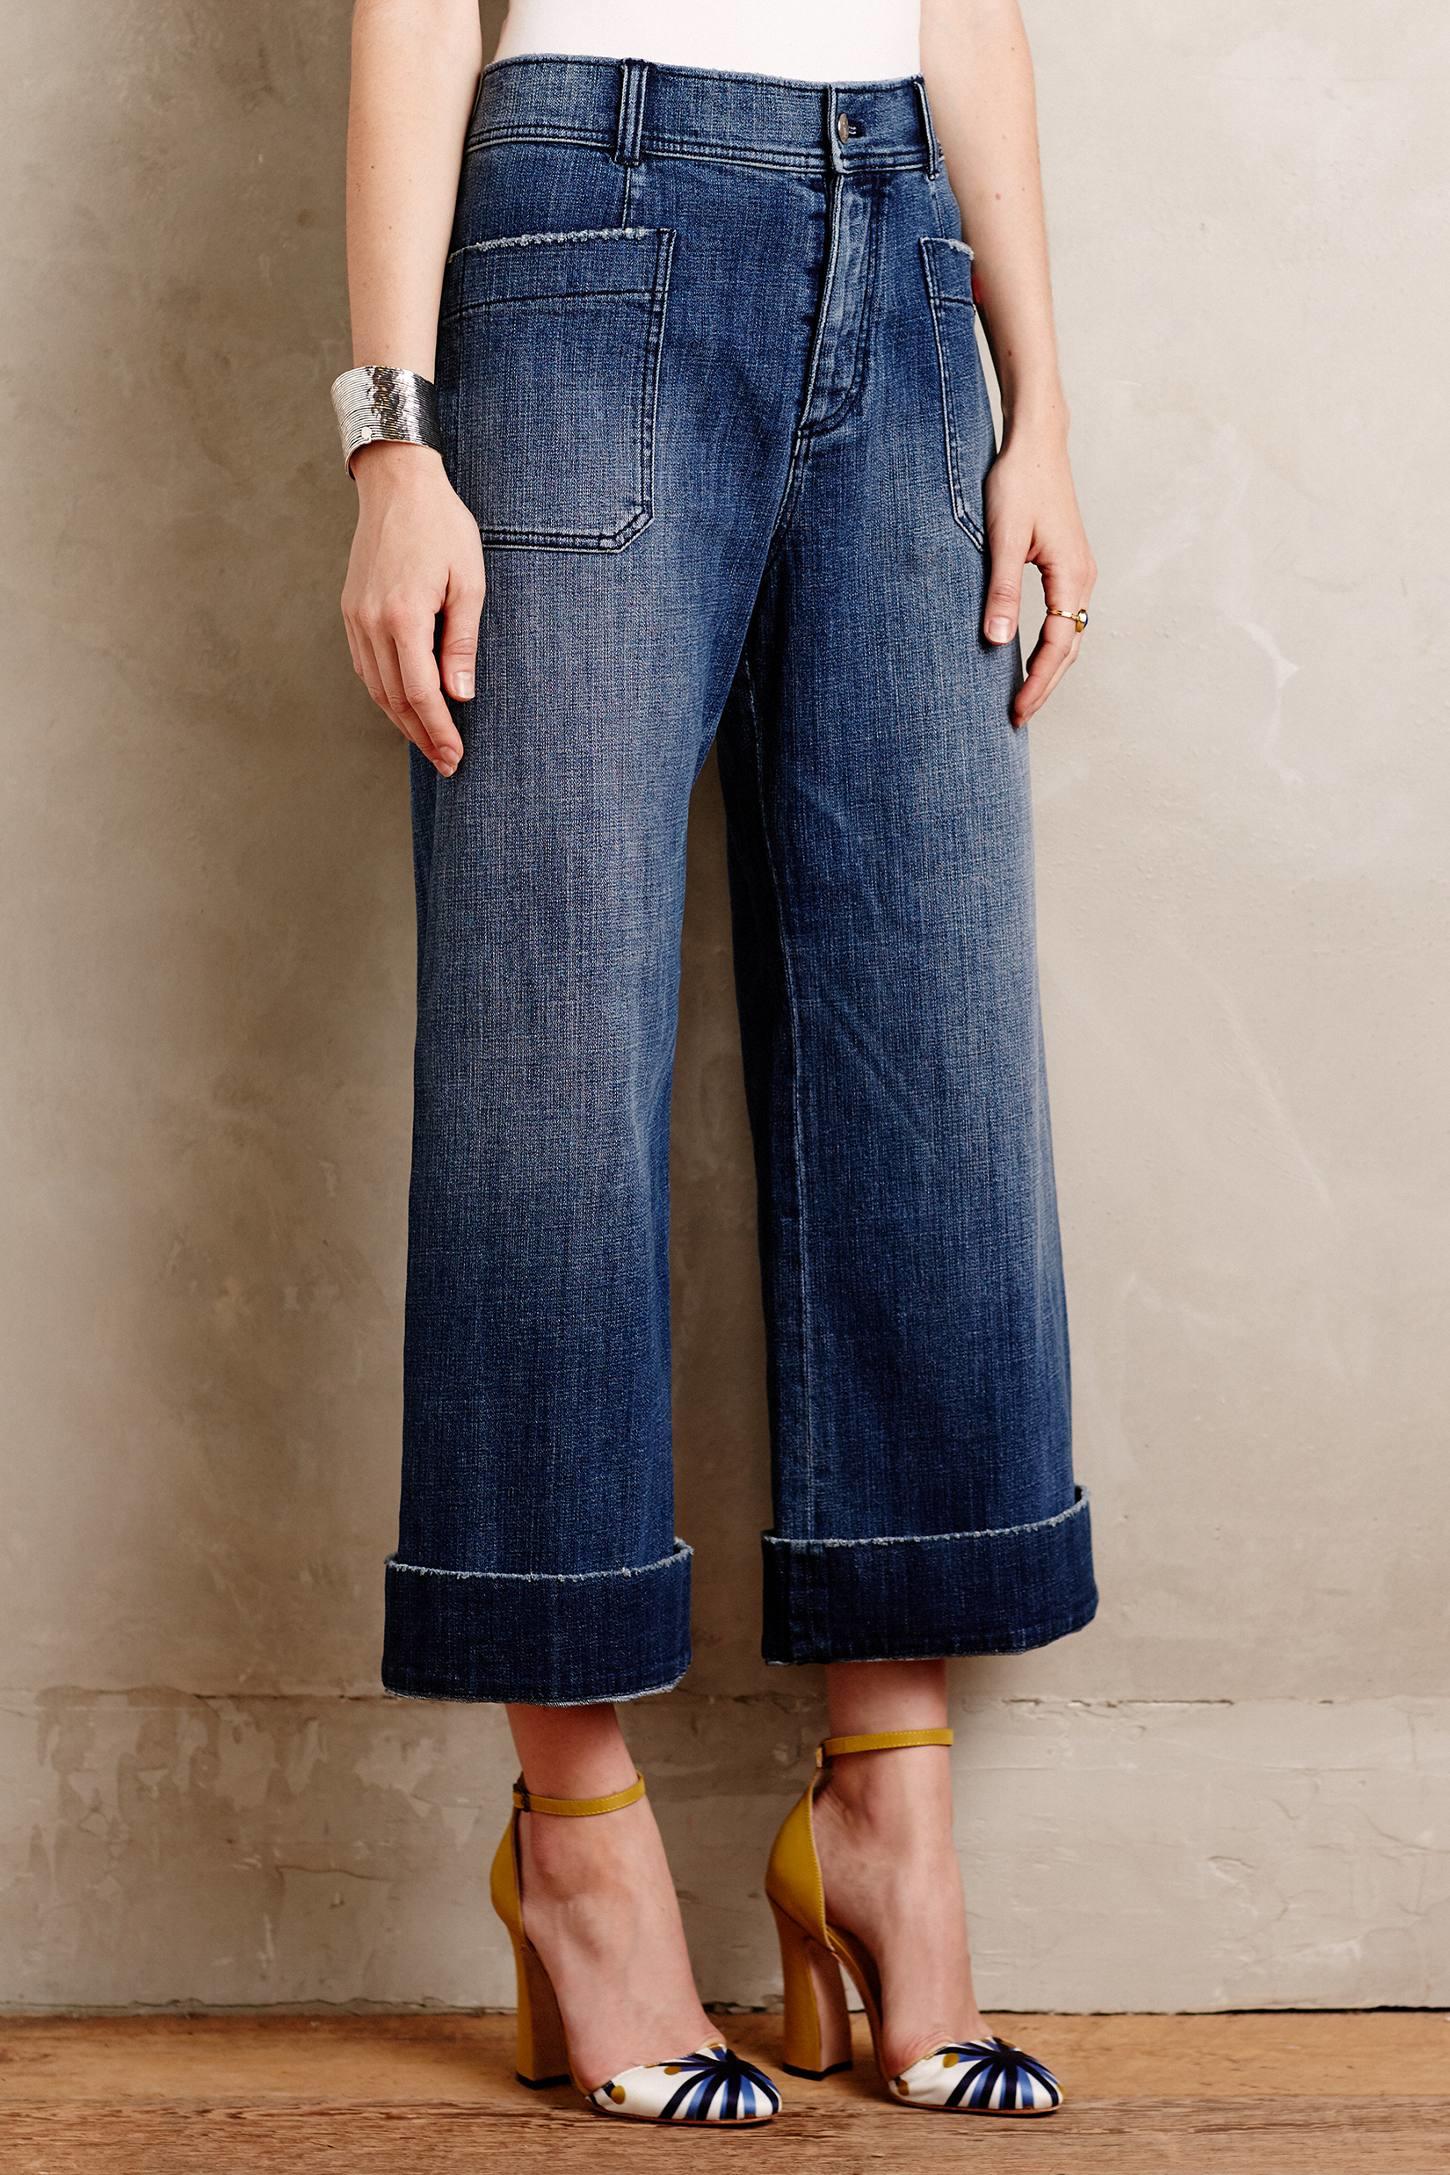 Lyst - Shop Women's Pilcro Jeans from $88